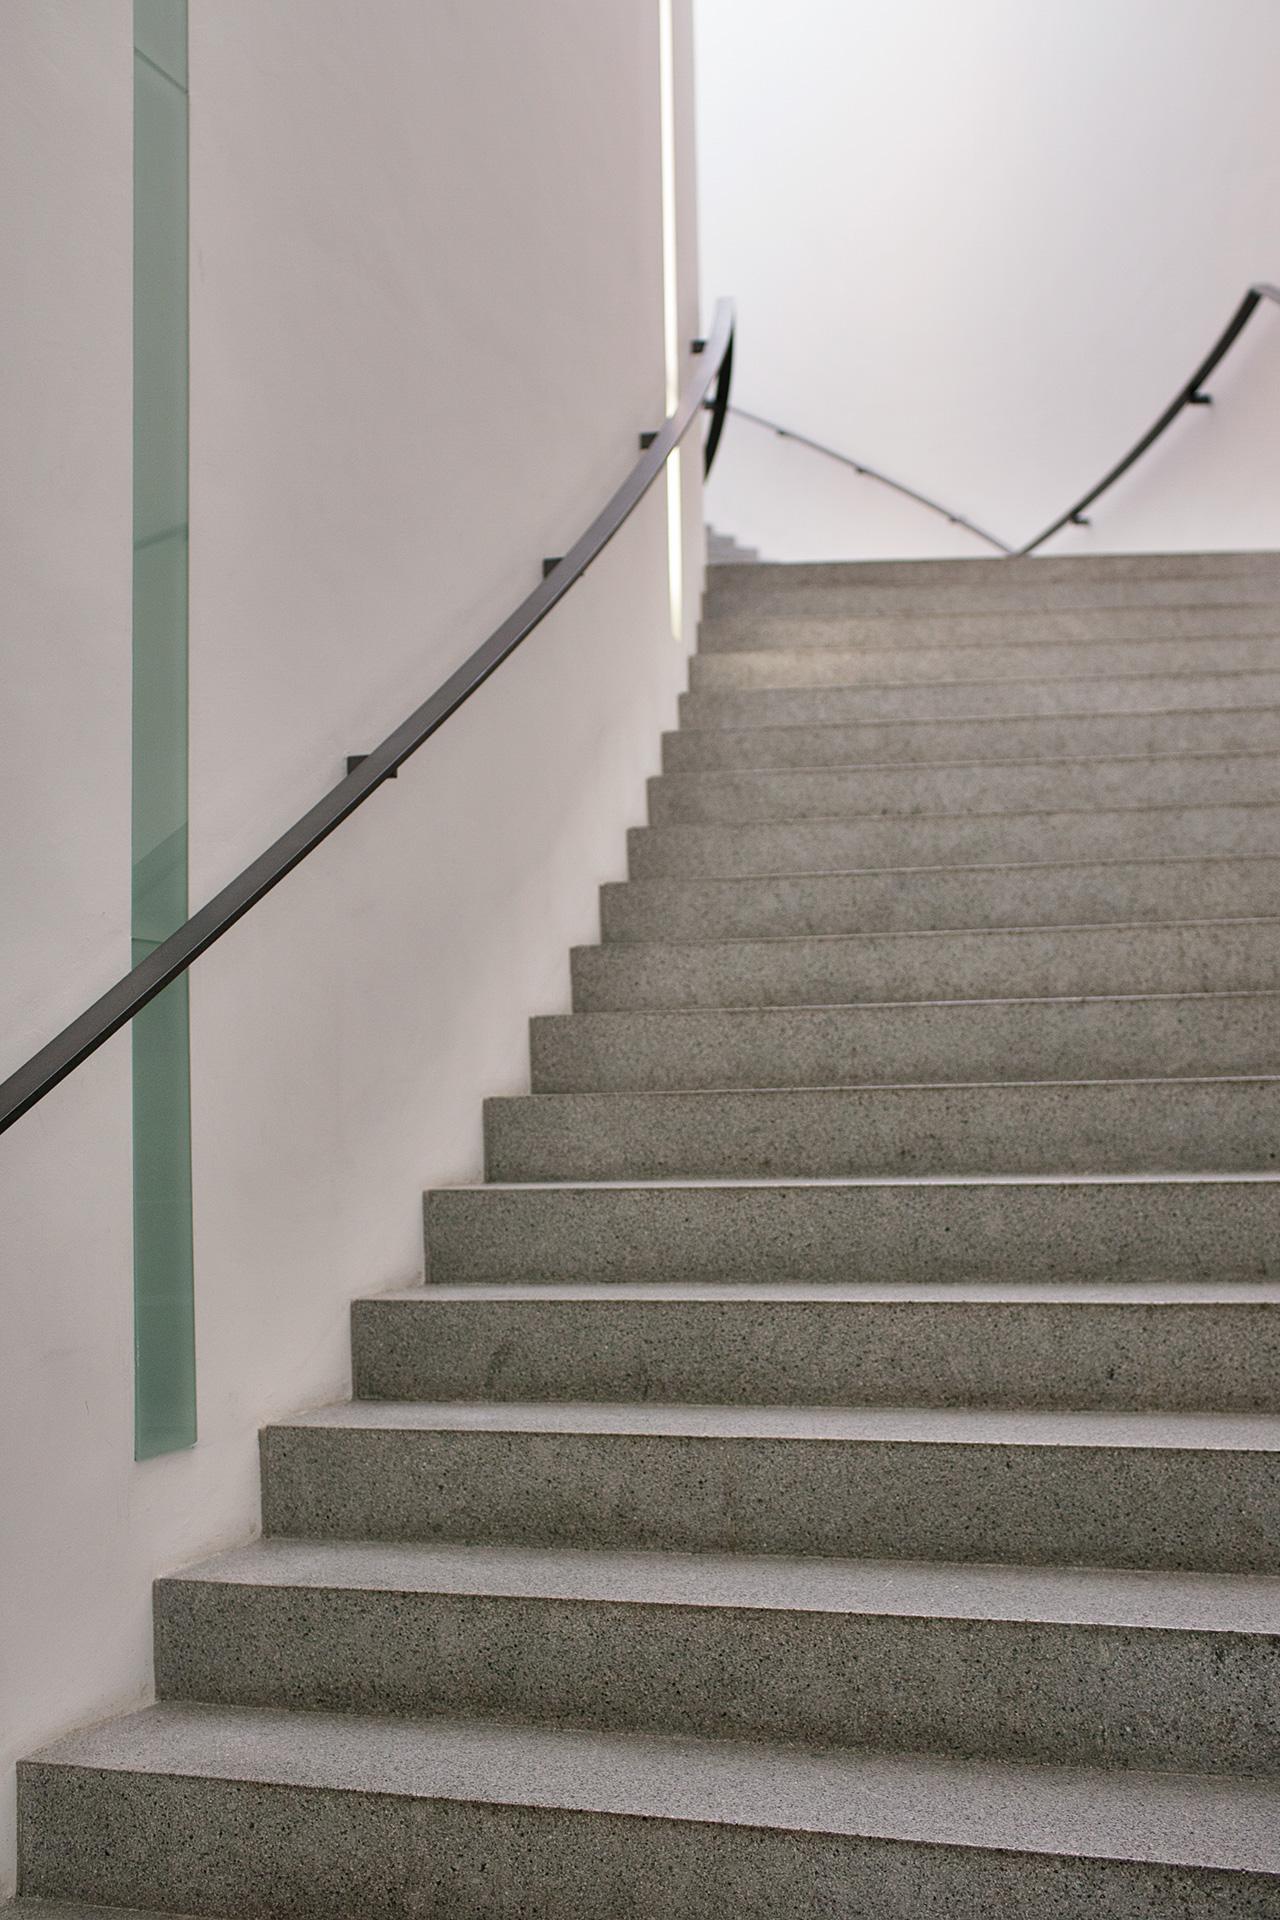 _nf-Munchen-PinakothekDerModerne-stairs